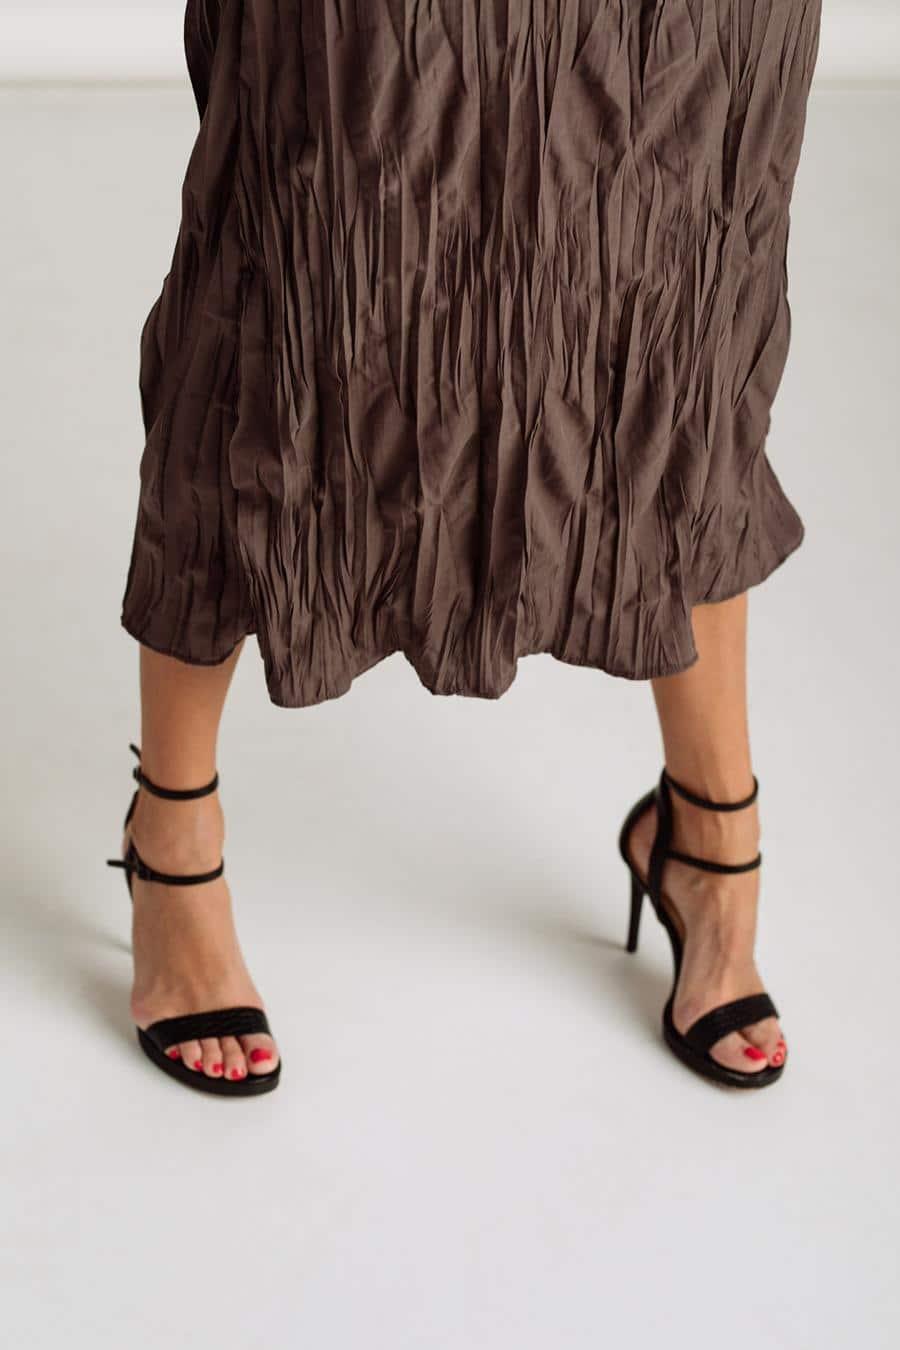 jagger zenska haljina kolekcija prolece leto 2021 ss 2021 kupi online jg 5488 05 4